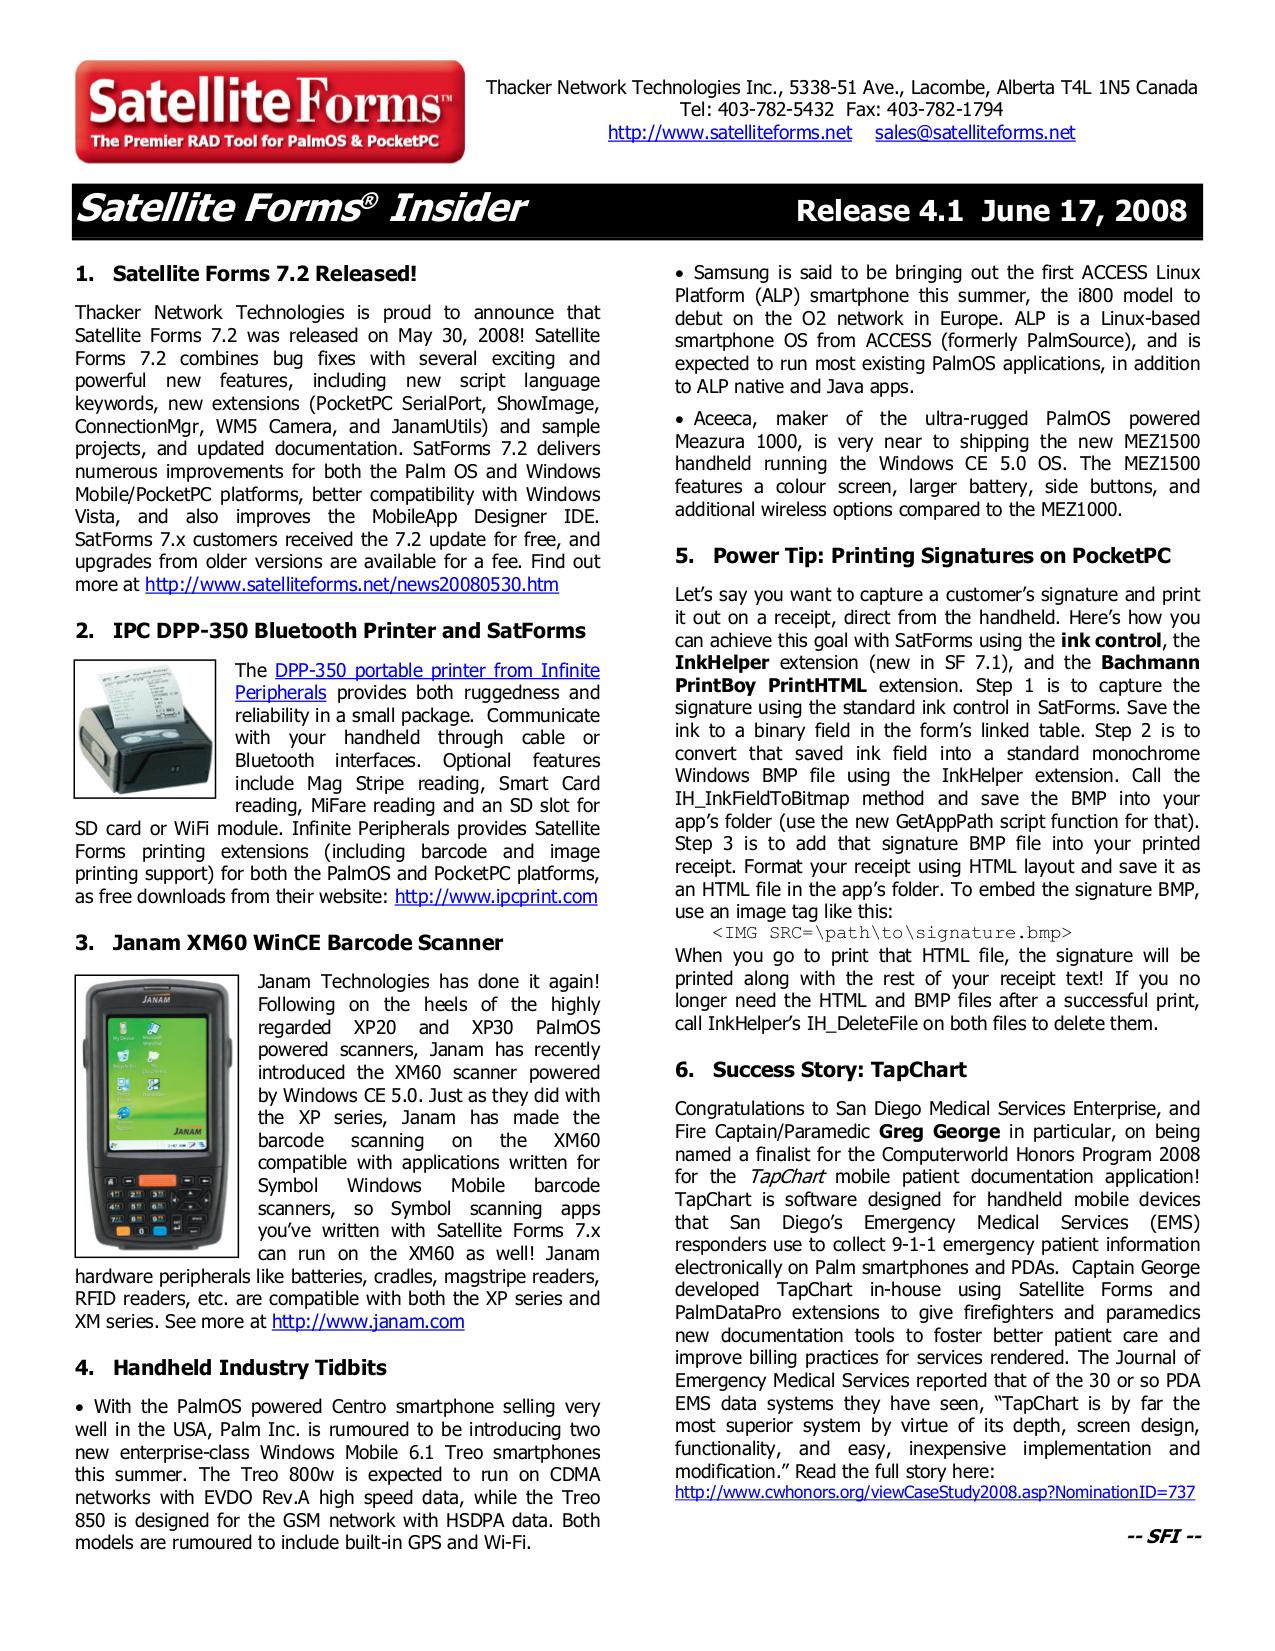 pdf for Janam PDA XM60 manual